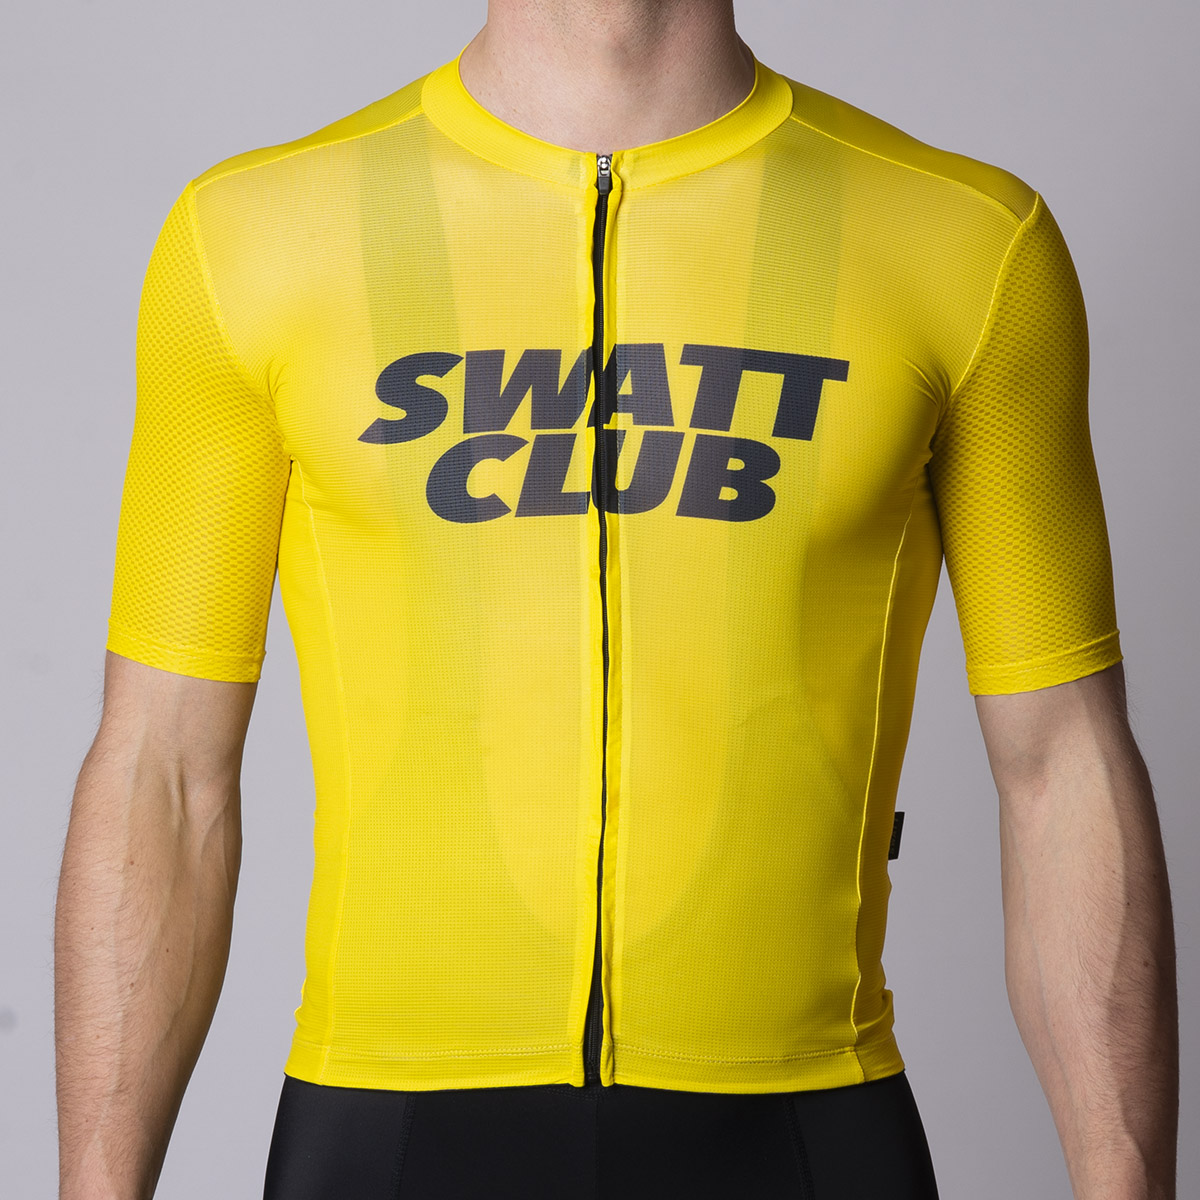 TDF cycling jersey swatt club